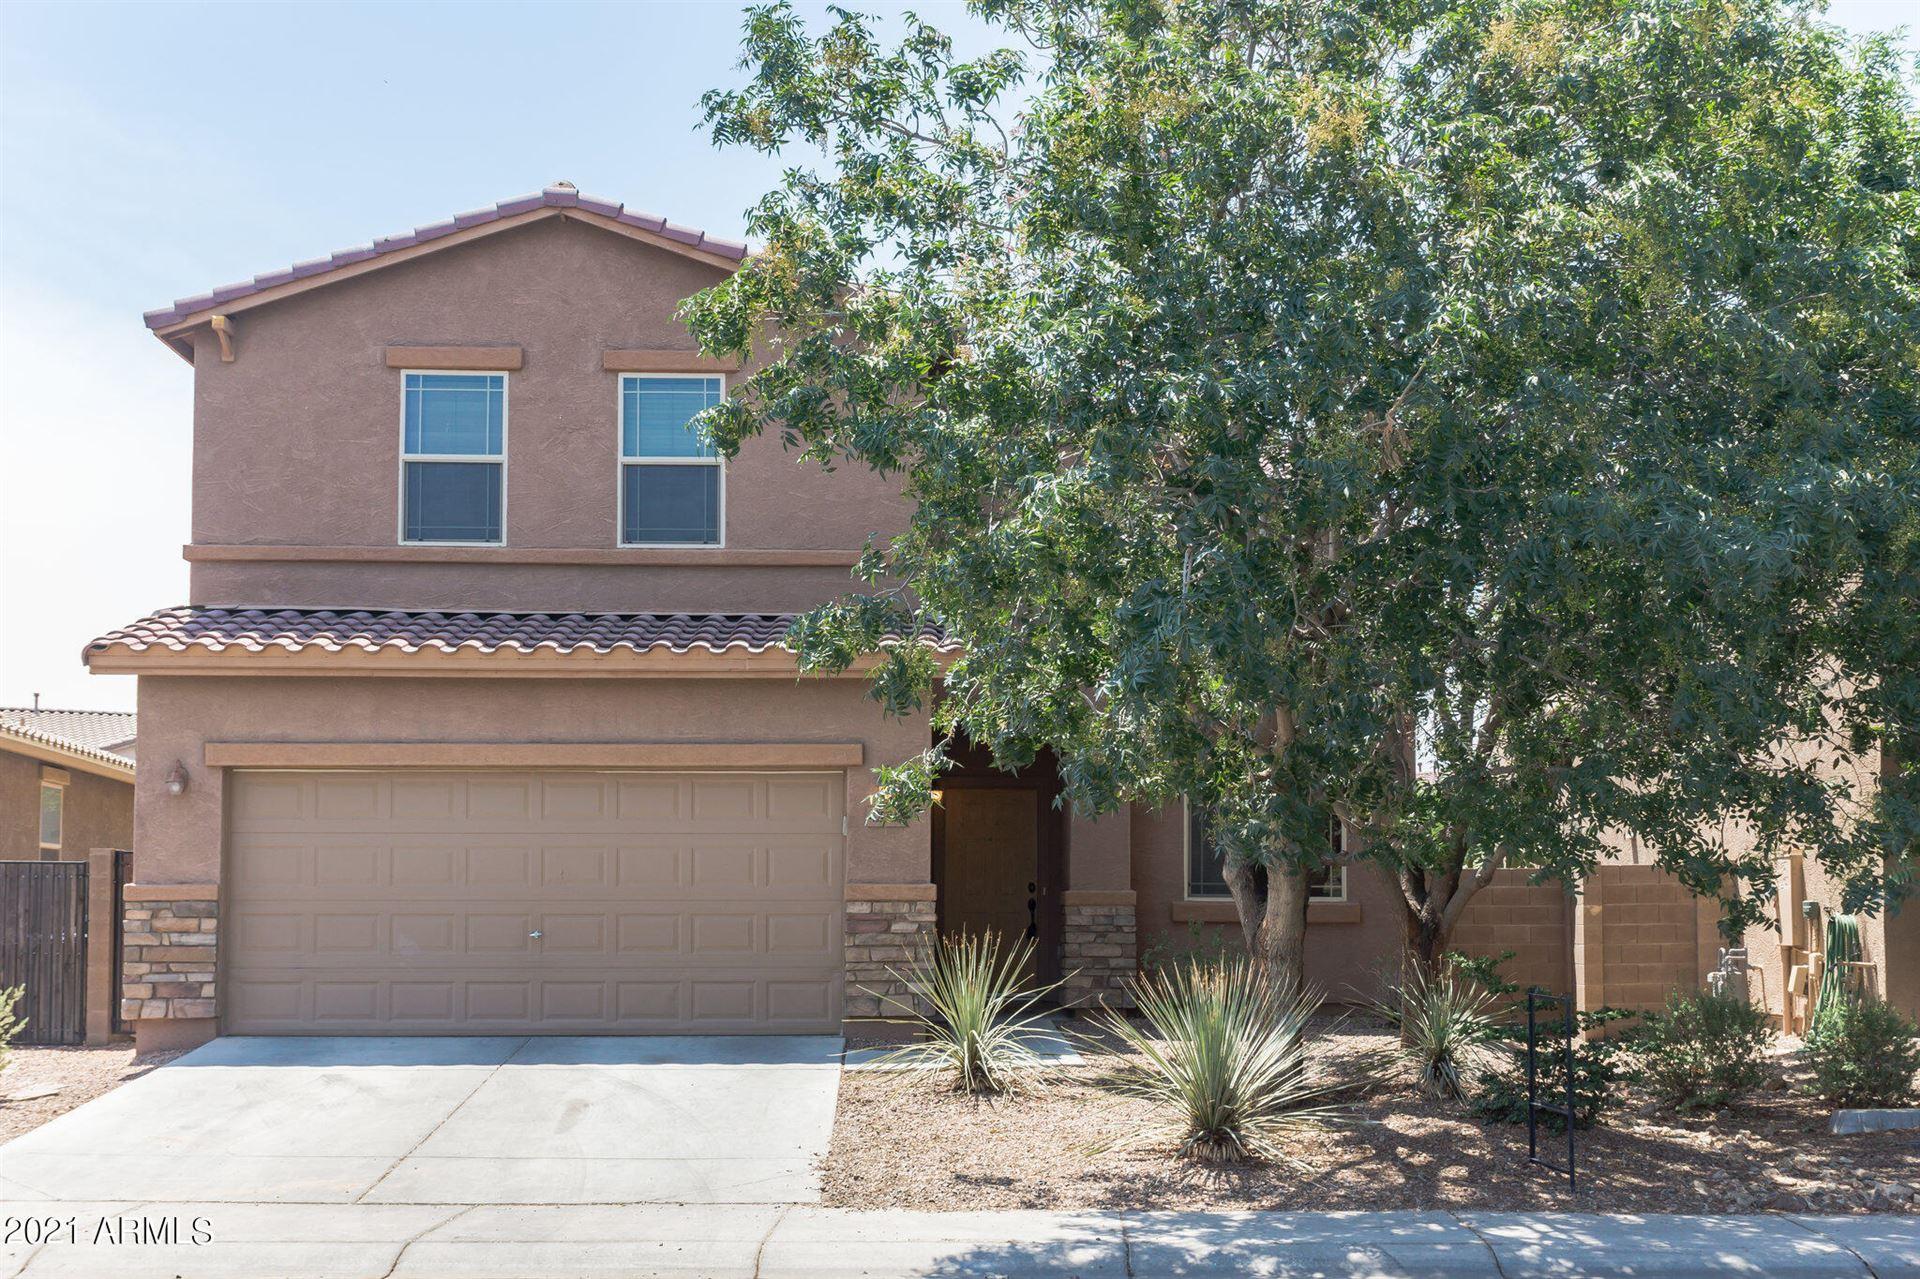 Photo for 42393 W SOMERSET Drive, Maricopa, AZ 85138 (MLS # 6251200)